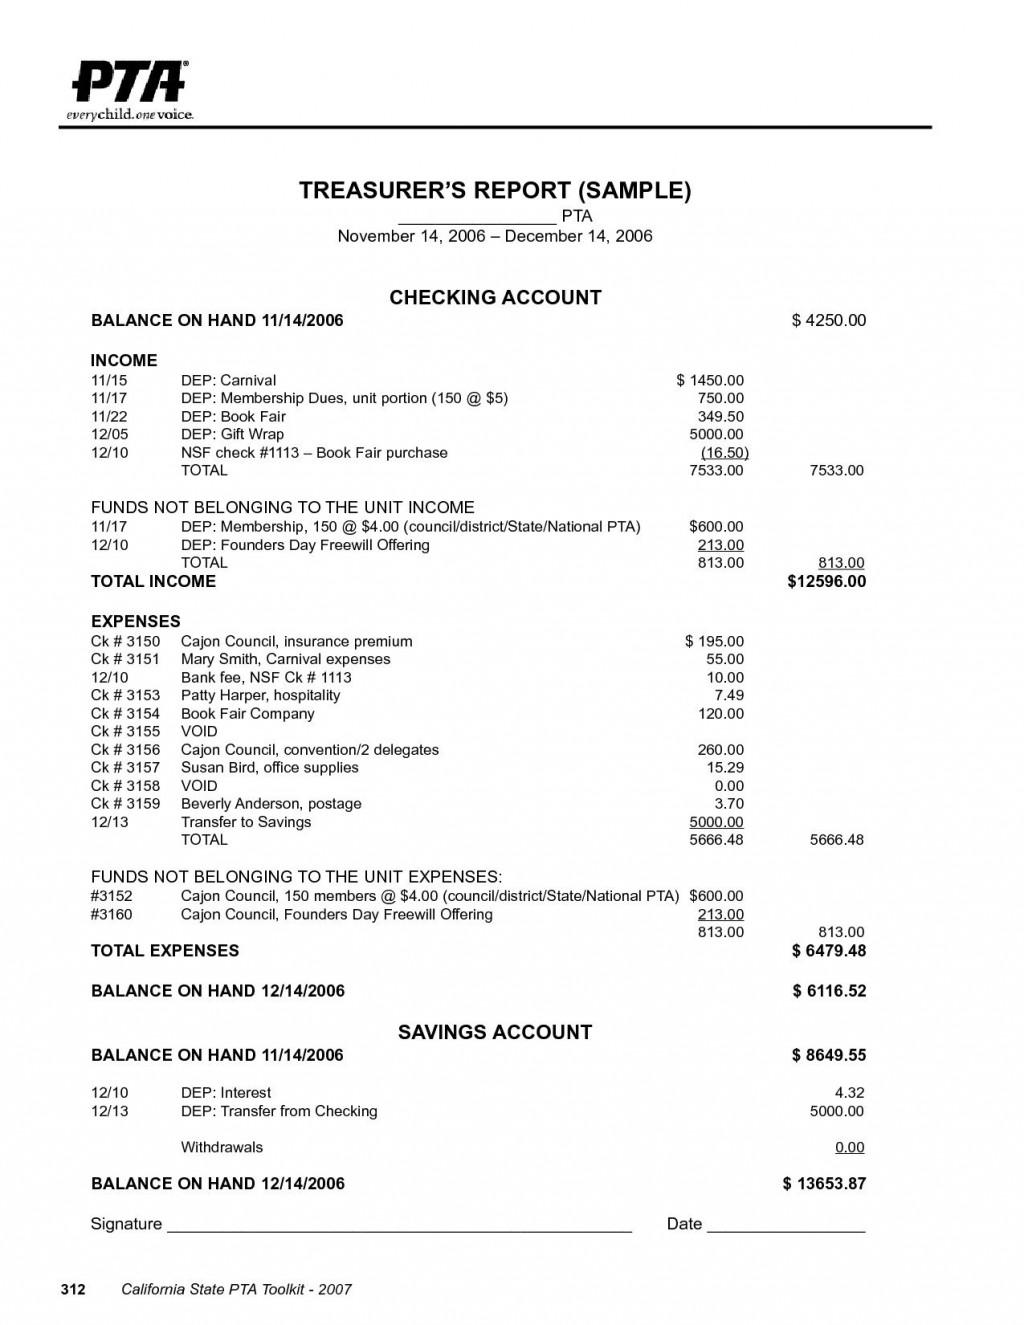 006 Fantastic Treasurer Report Template Non Profit Image  Treasurer' Word Free For Nonprofit OrganizationLarge